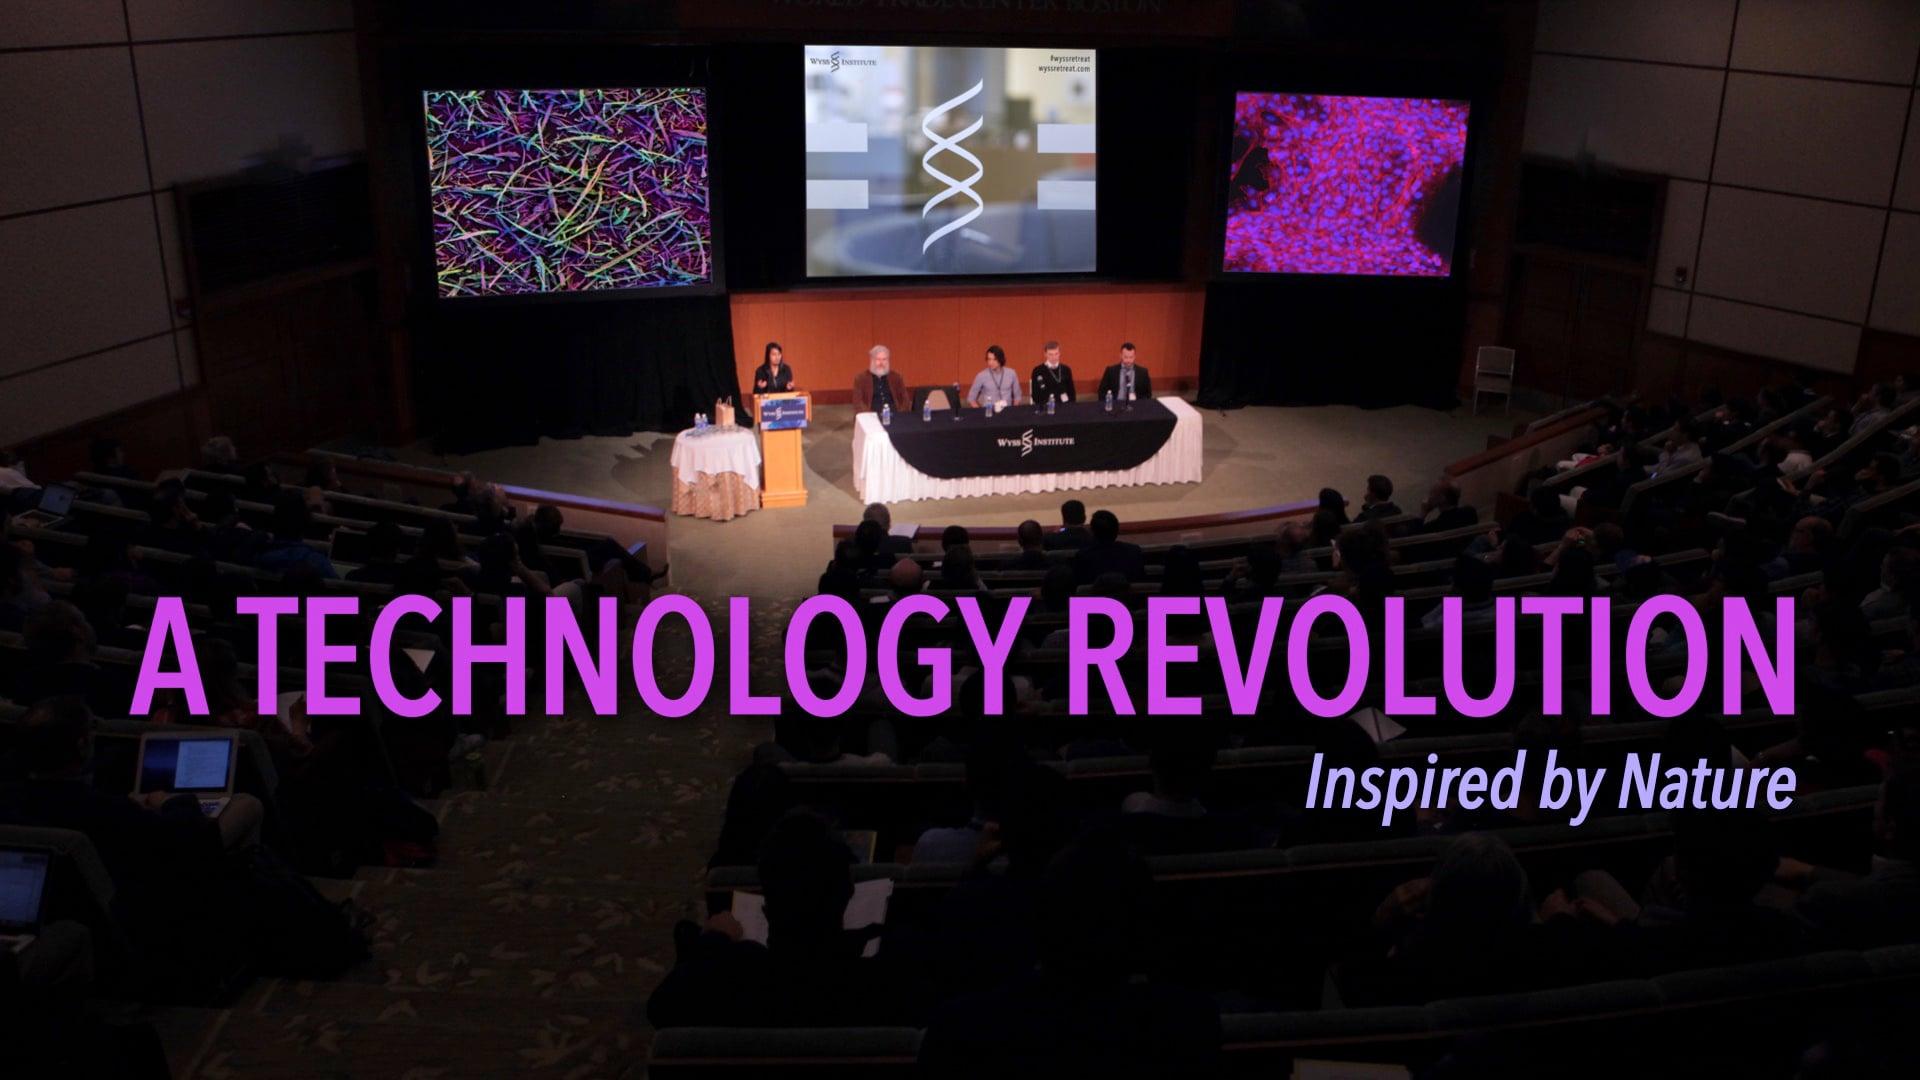 Wyss Institute: A Technology Revolution